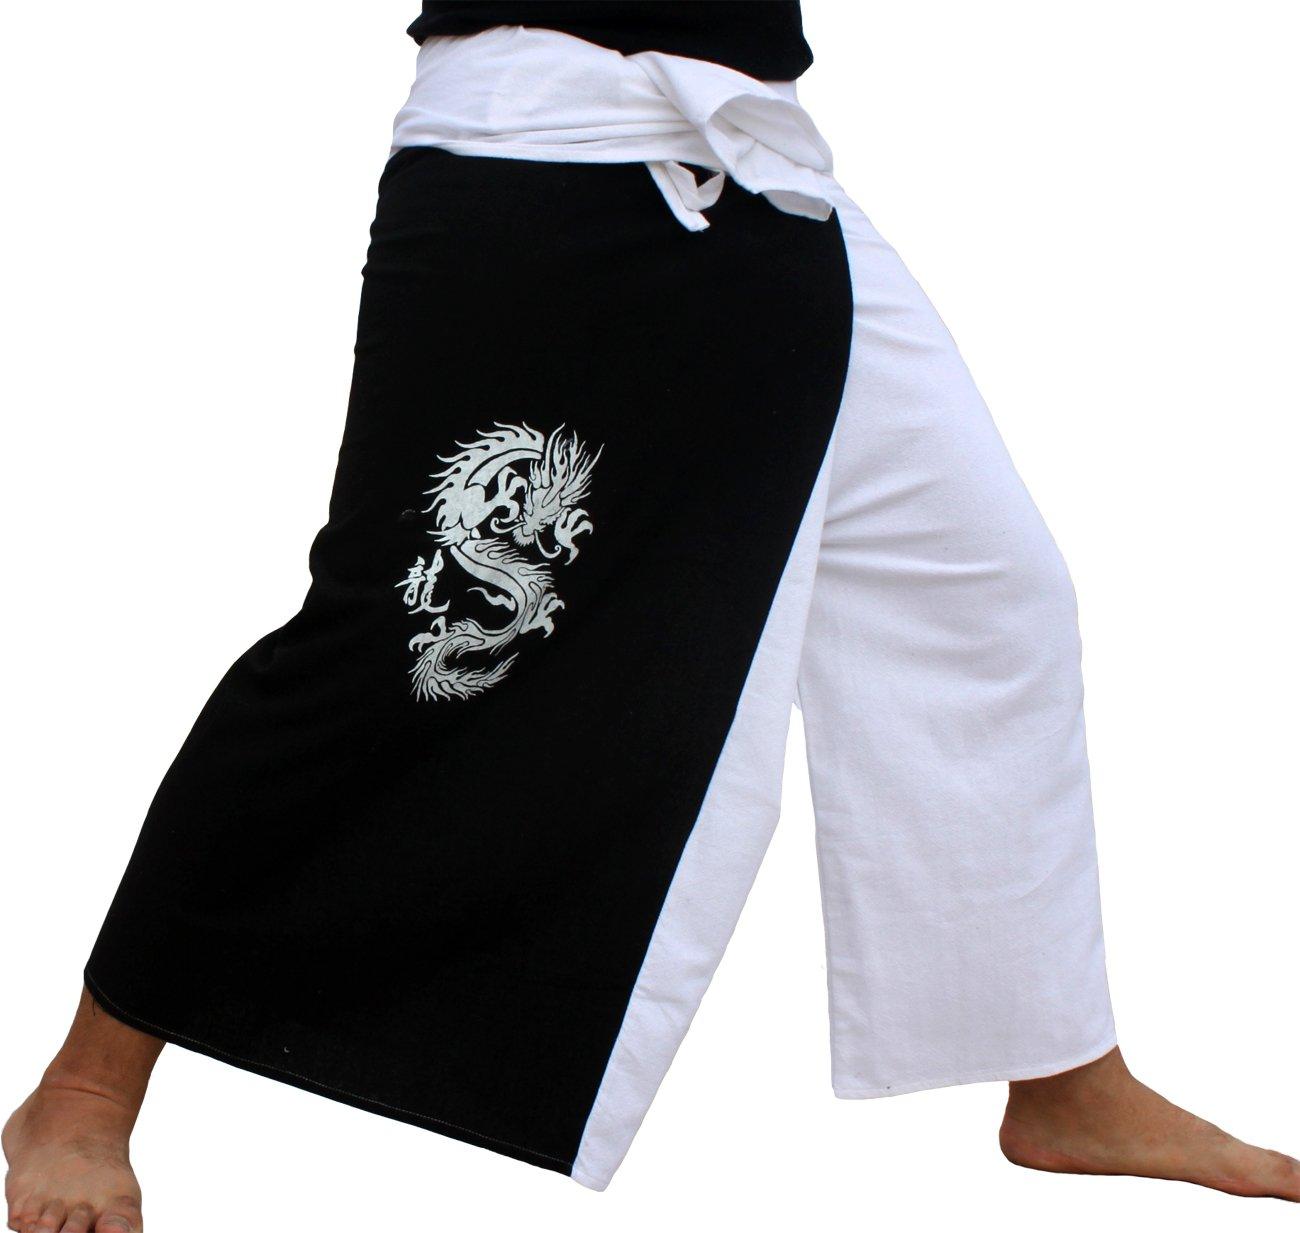 Raan Pah Muang RaanPahMuang Thick Cotton Two Color Fire Dragon Samurai Wrap Pants, X-Large, White With Black Panel by Raan Pah Muang